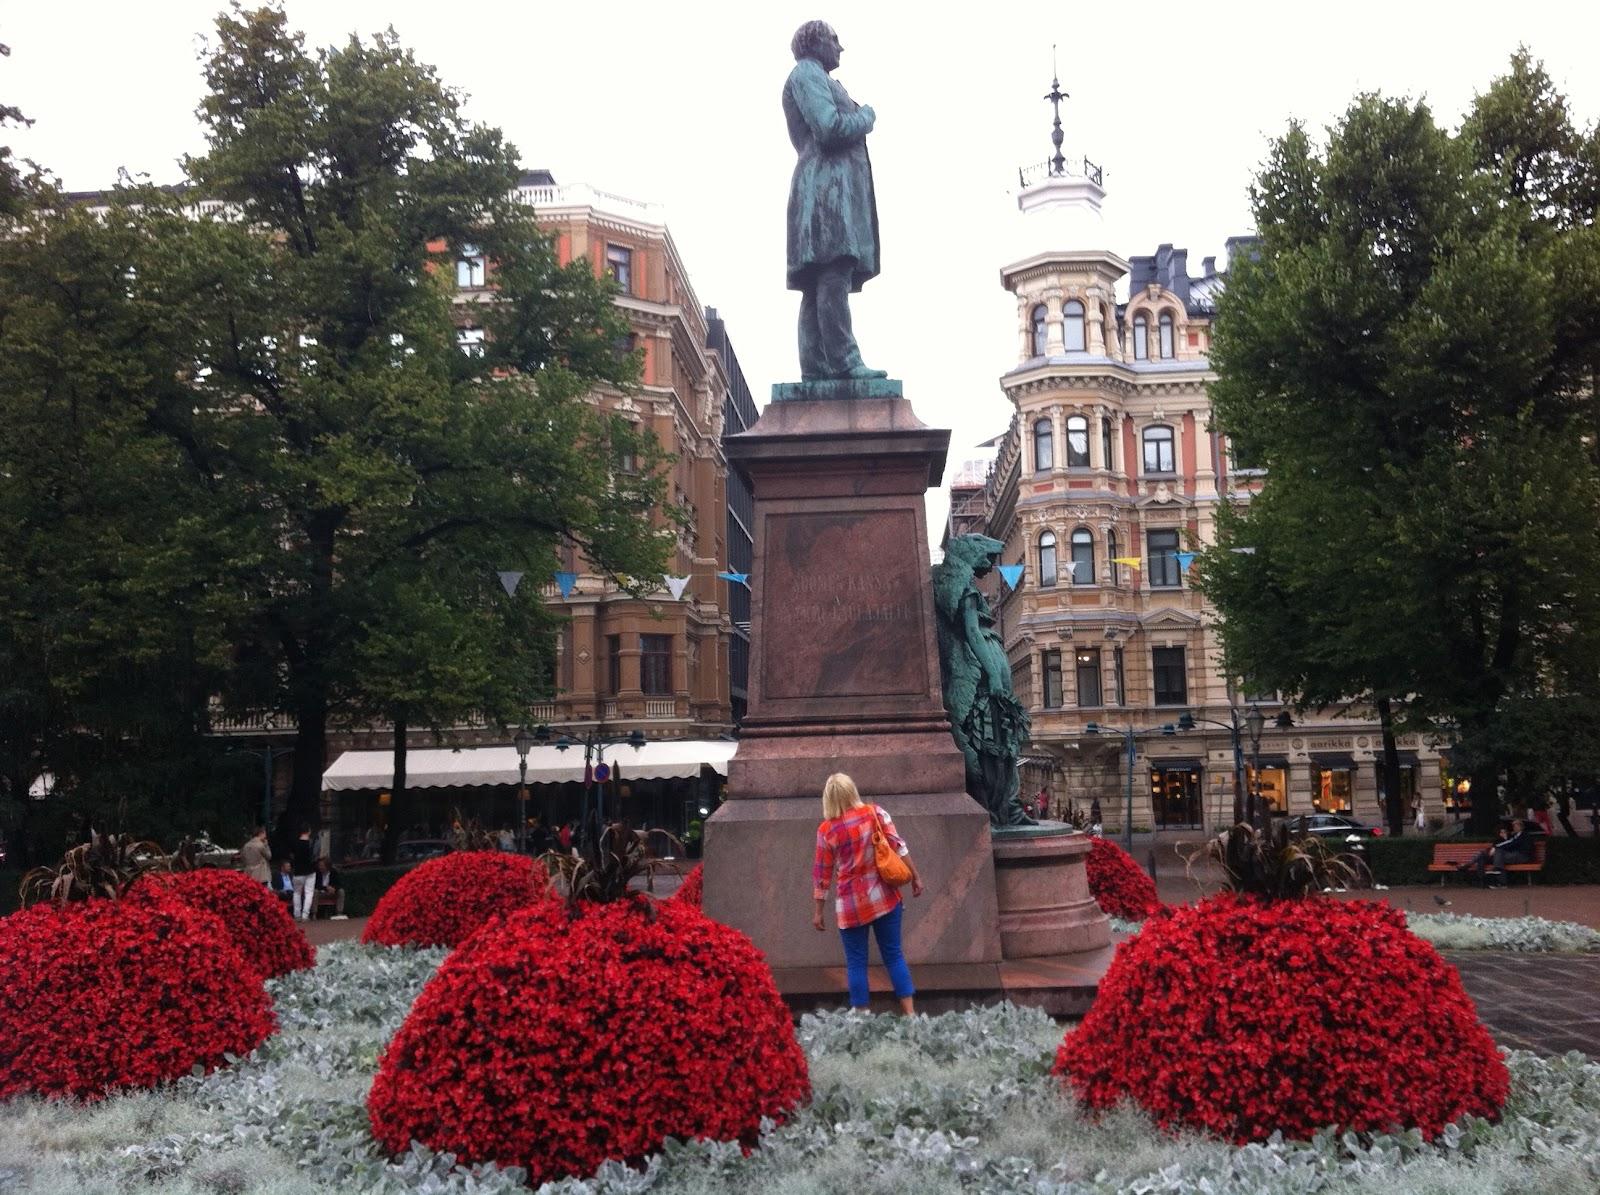 Muutama kuva Helsingistä ja Haminasta – Some photos from Helsinki and Hamina